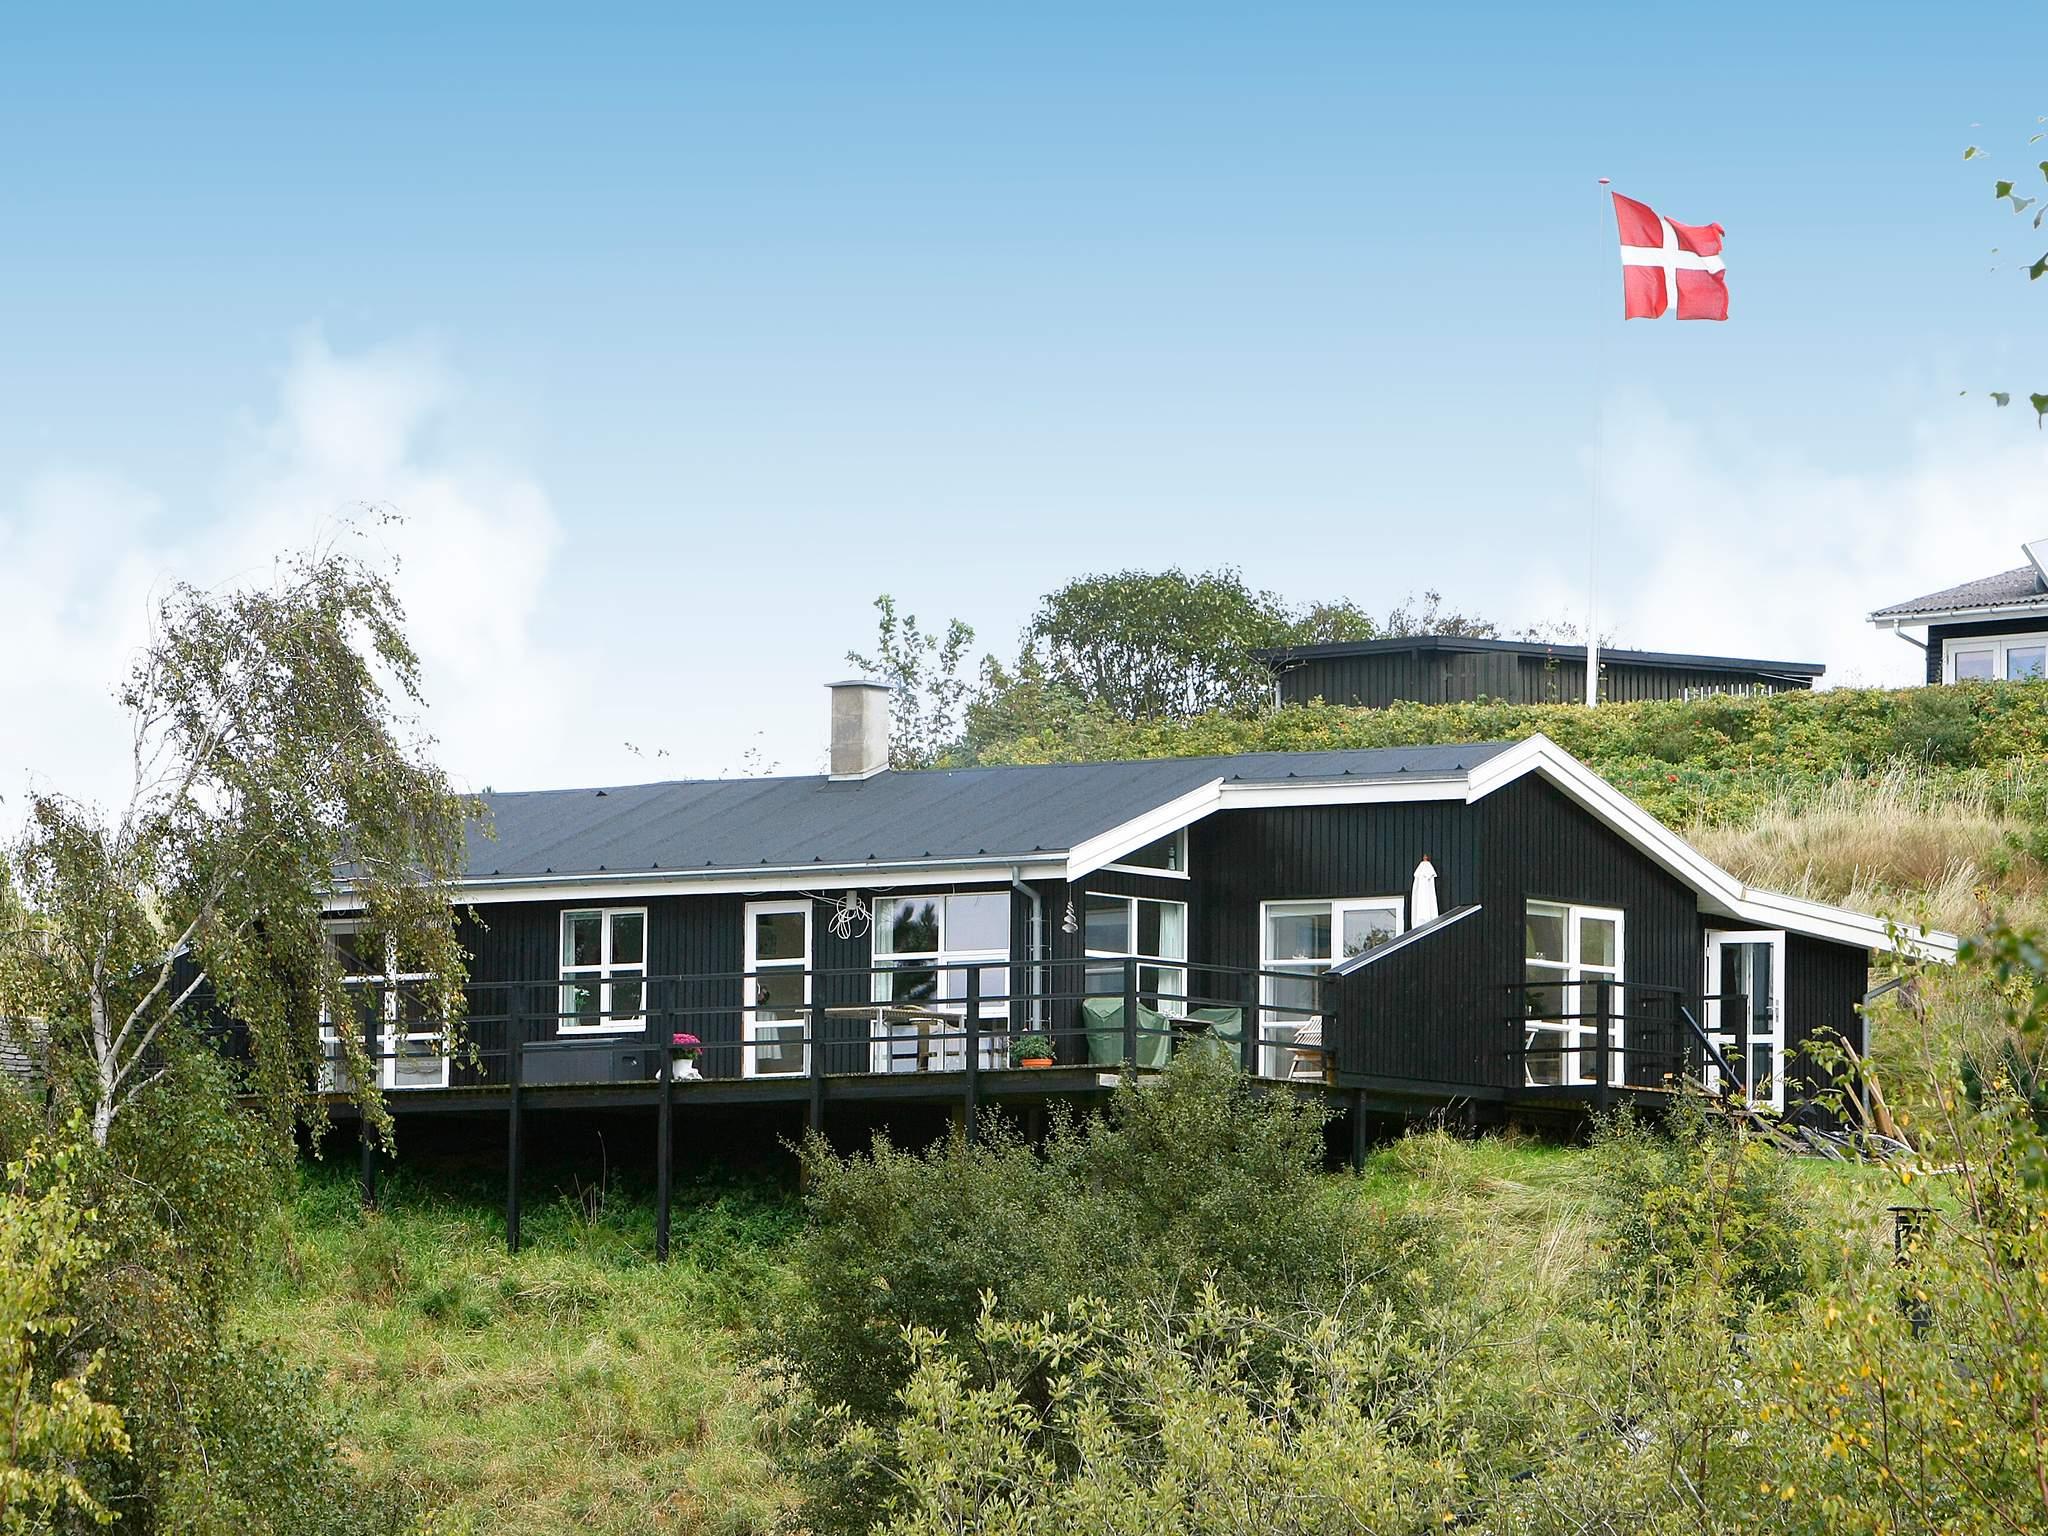 Maison de vacances Helgenæs (674636), Knebel, , Mer Baltique danoise, Danemark, image 1